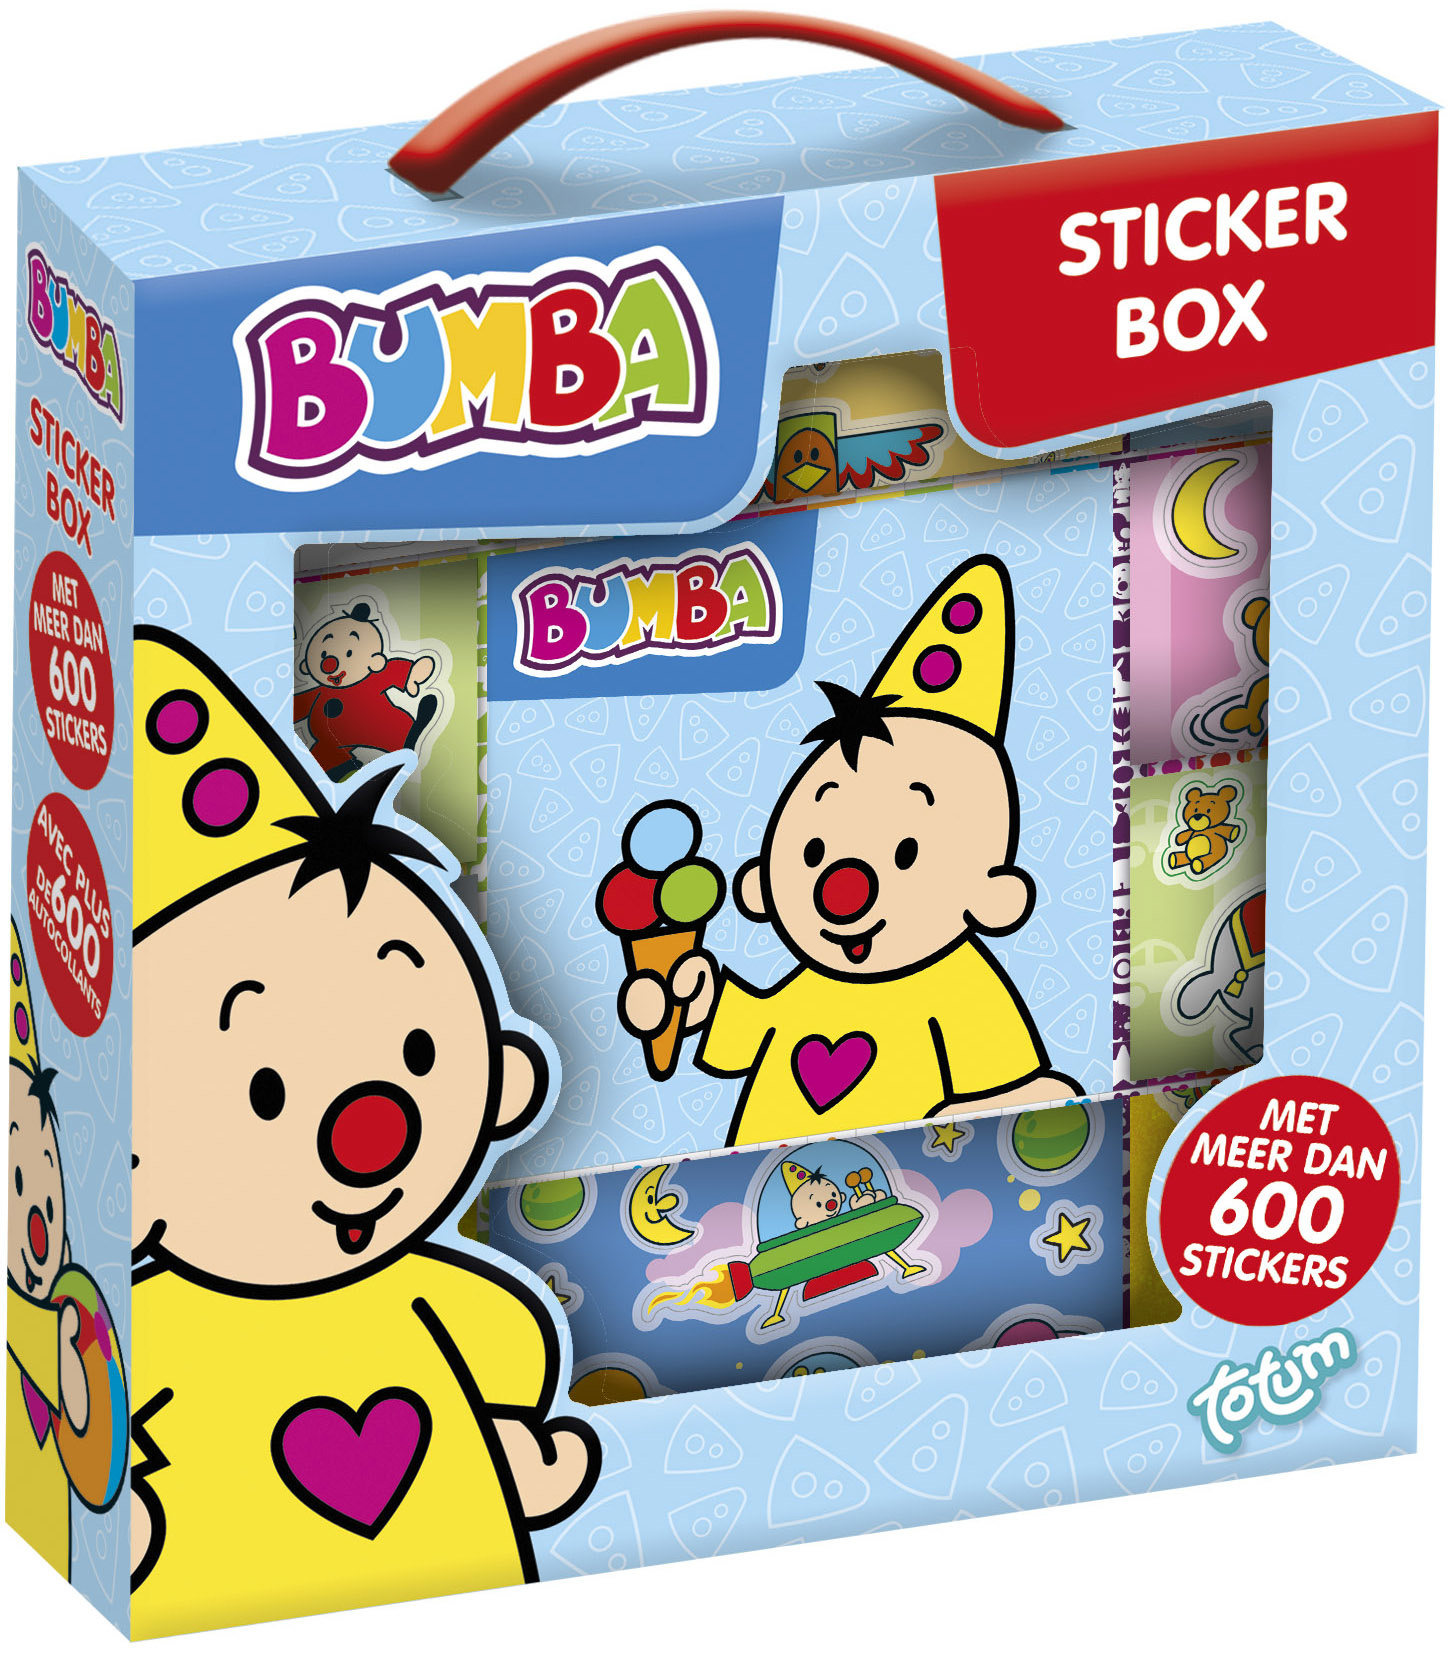 Sticker box Bumba ToTum: 1000+ stickers